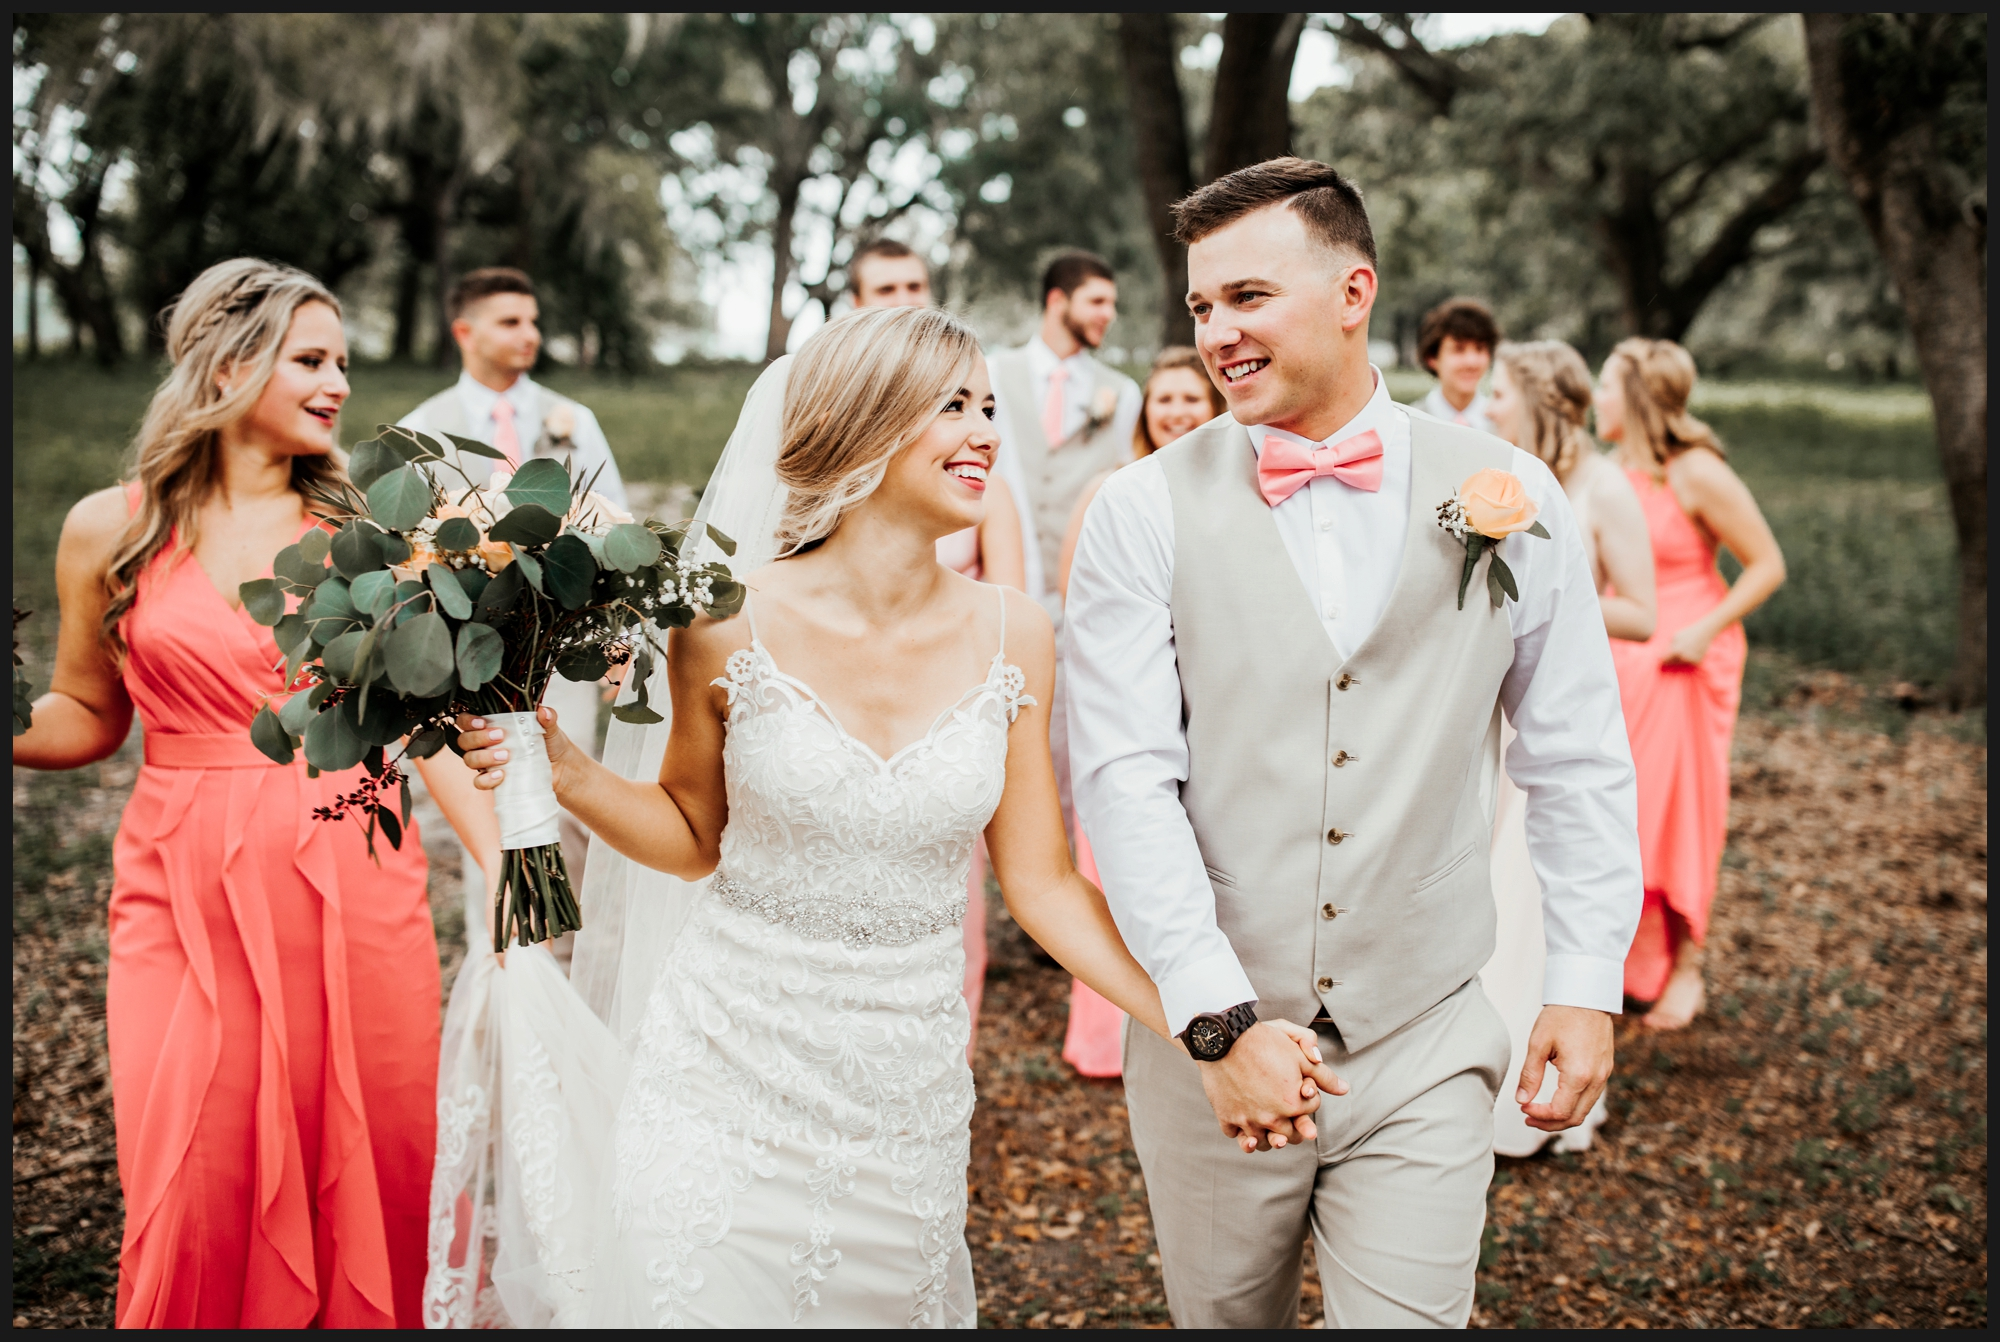 Orlando-Wedding-Photographer-destination-wedding-photographer-florida-wedding-photographer-hawaii-wedding-photographer_0302.jpg